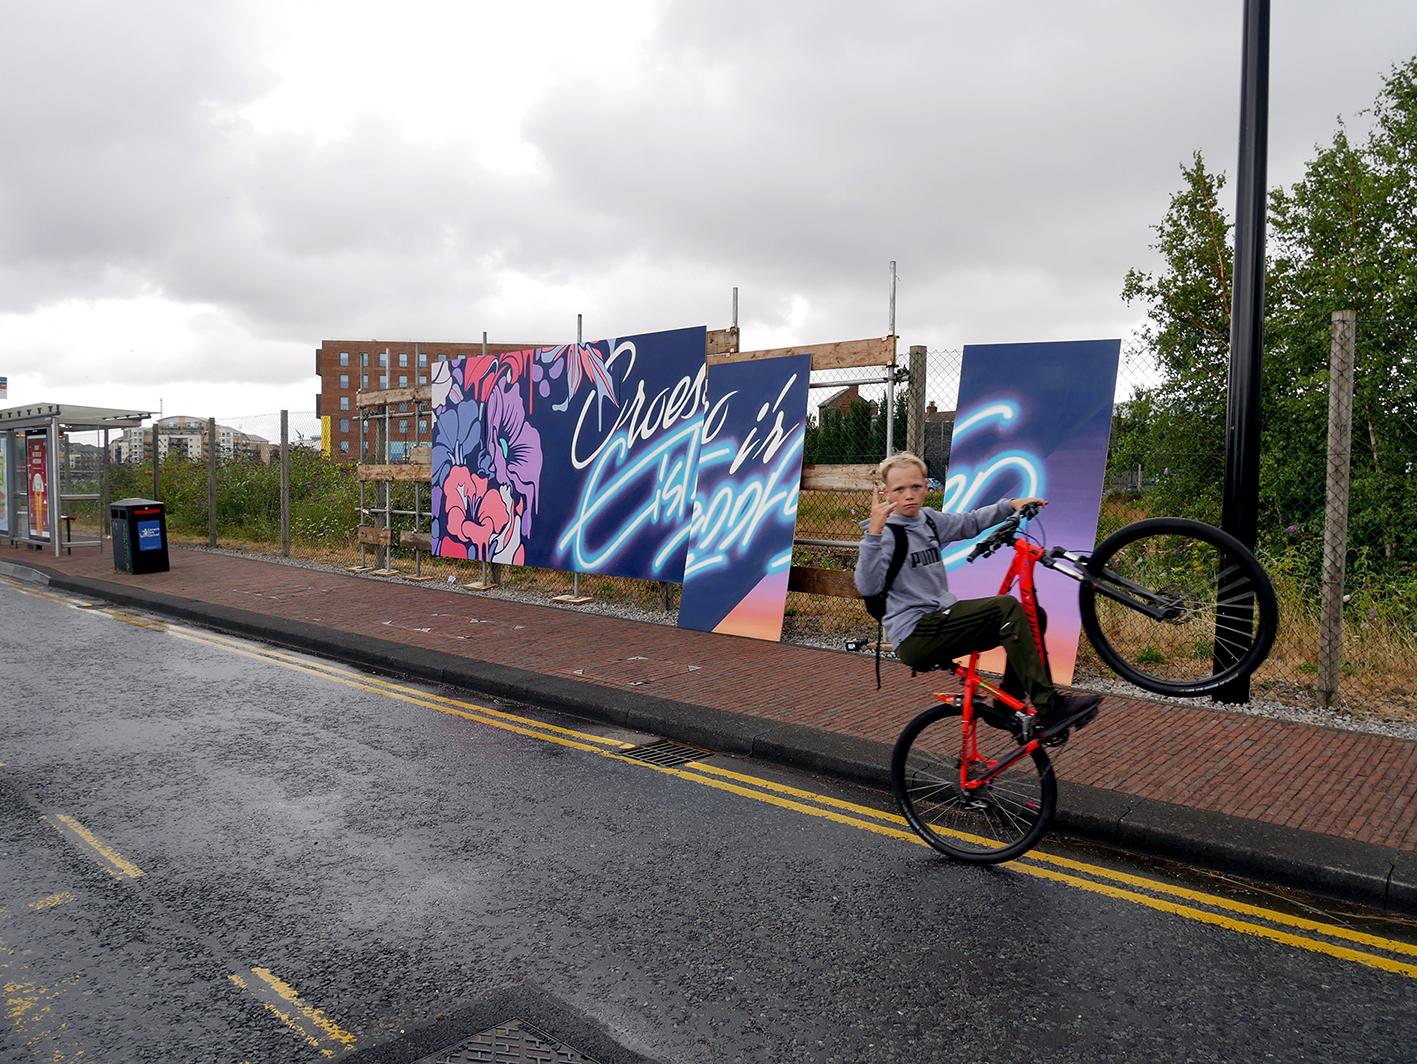 Nerone-street-art-Cardif-neone 8